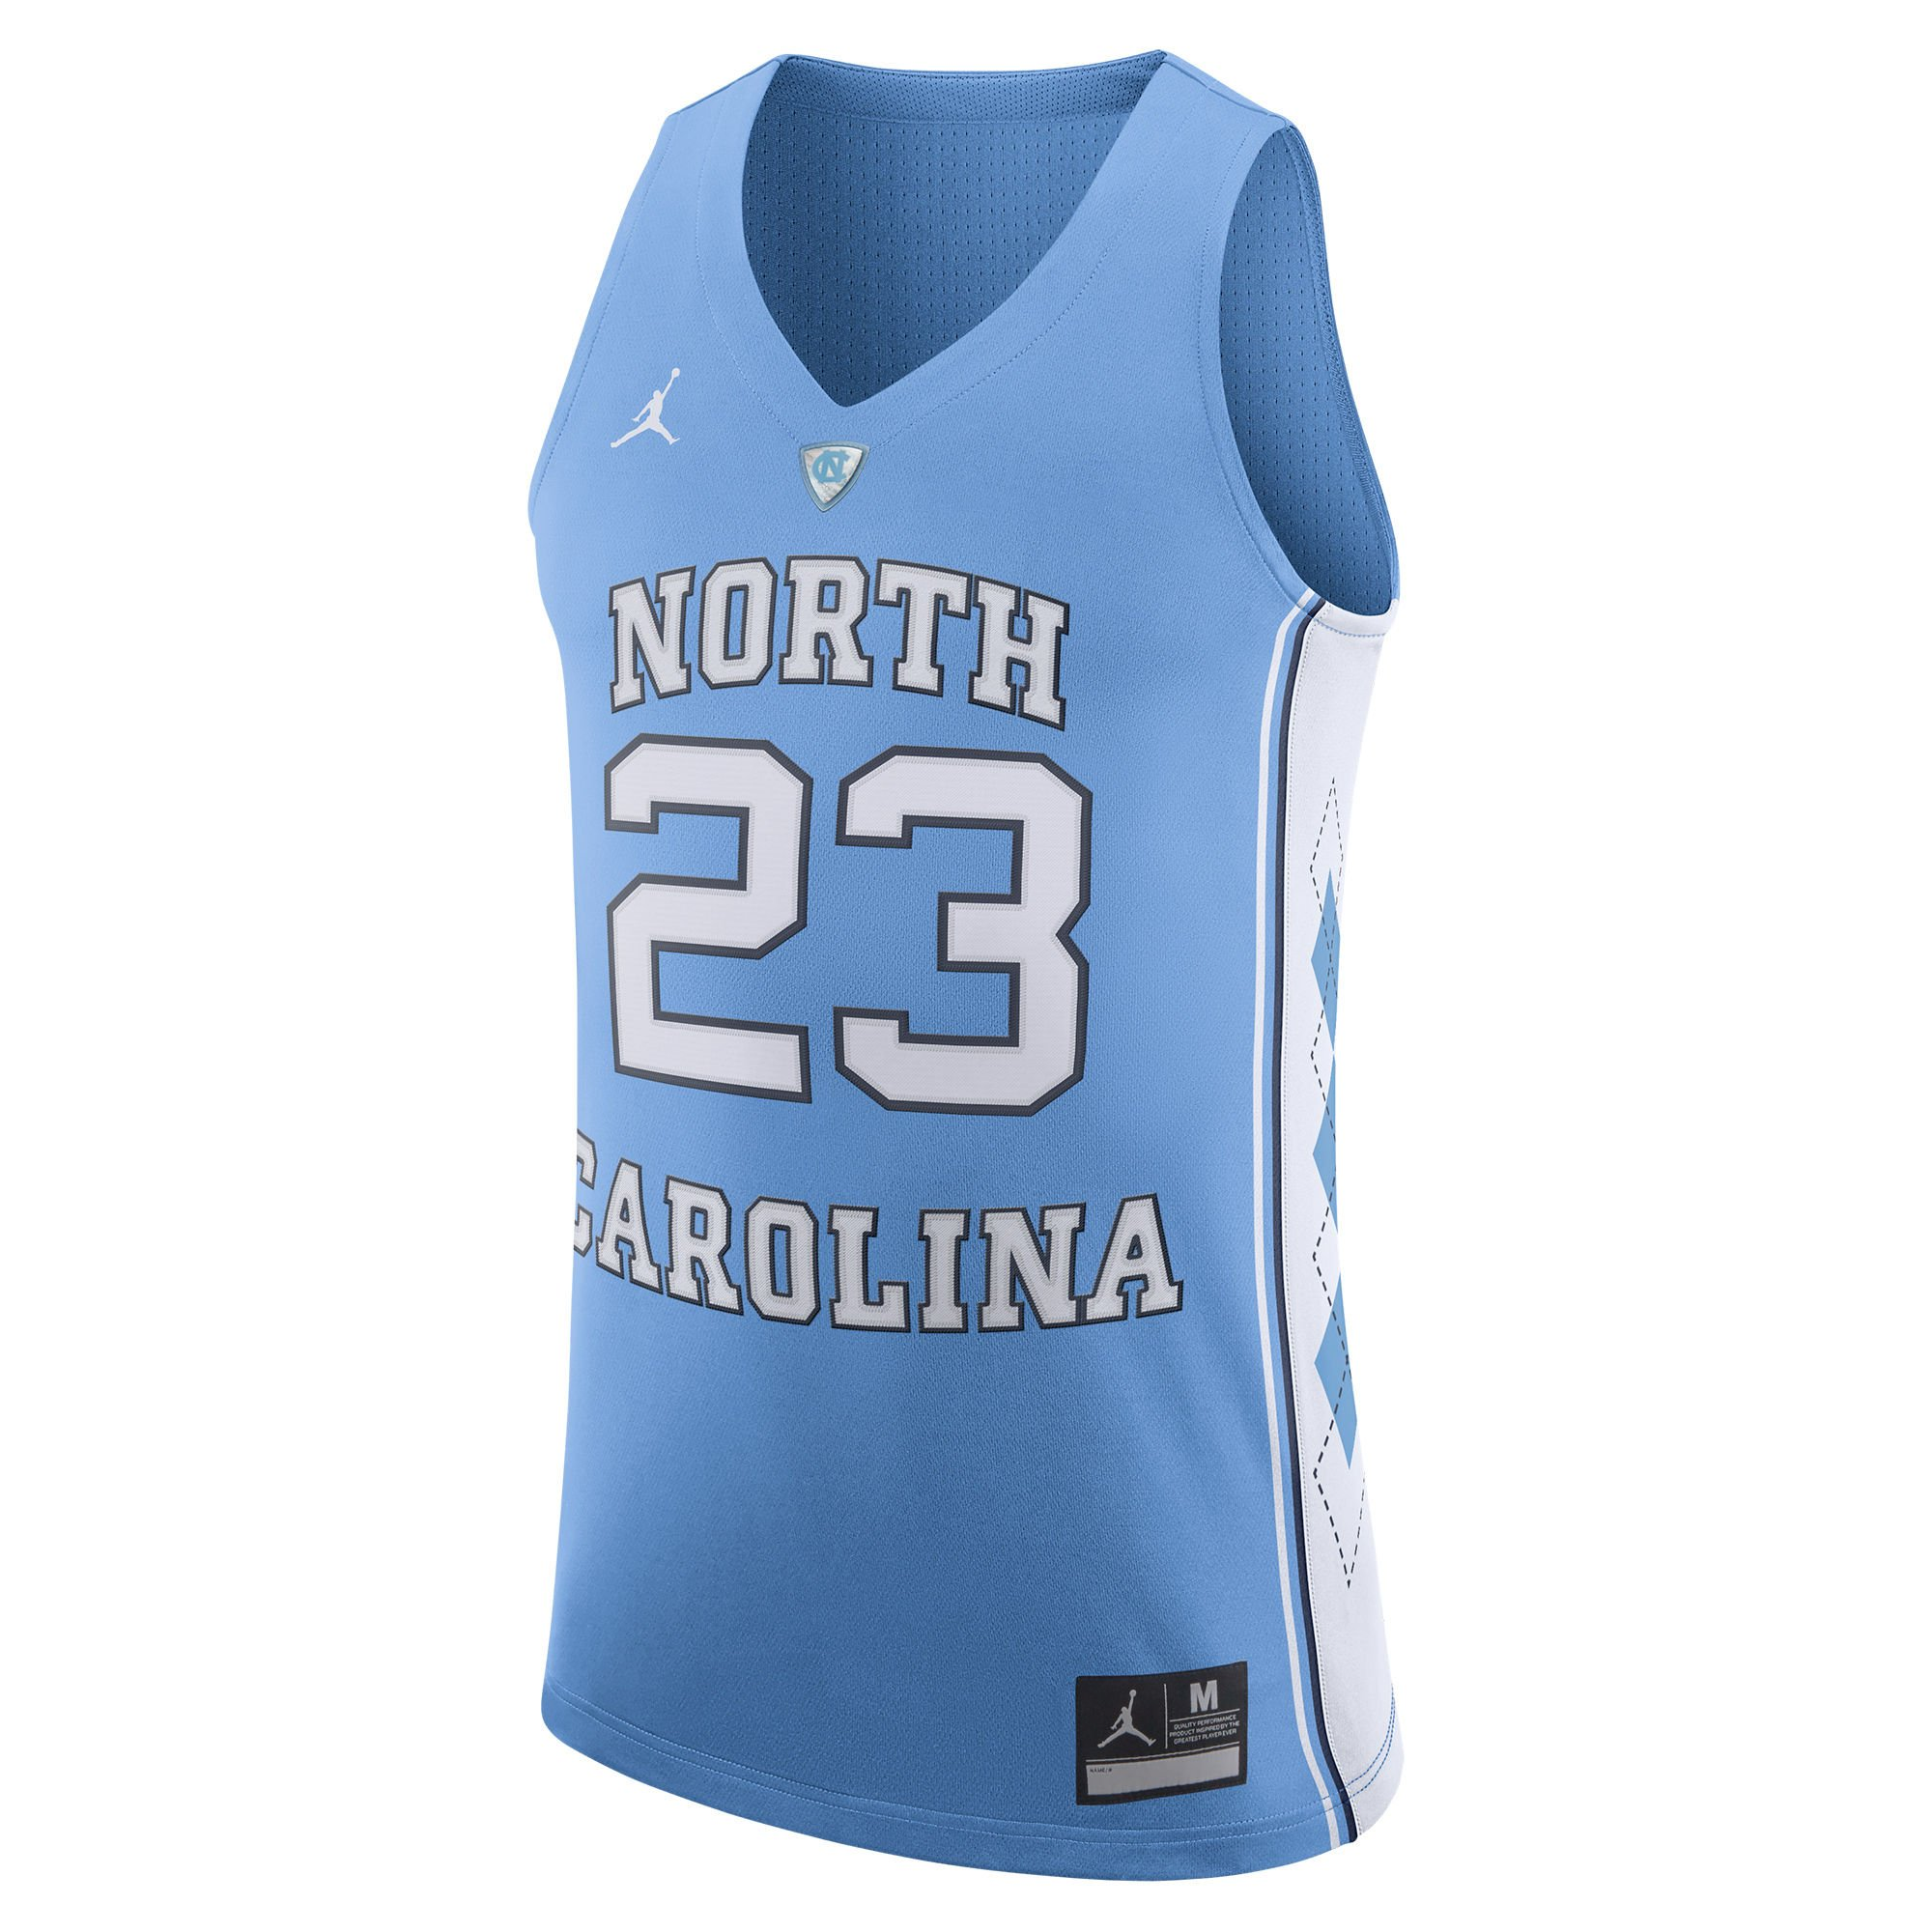 Jordan Brand Michael Jordan North Carolina Tar Heels Light Blue Authentic Basketball Jersey - Men's Large